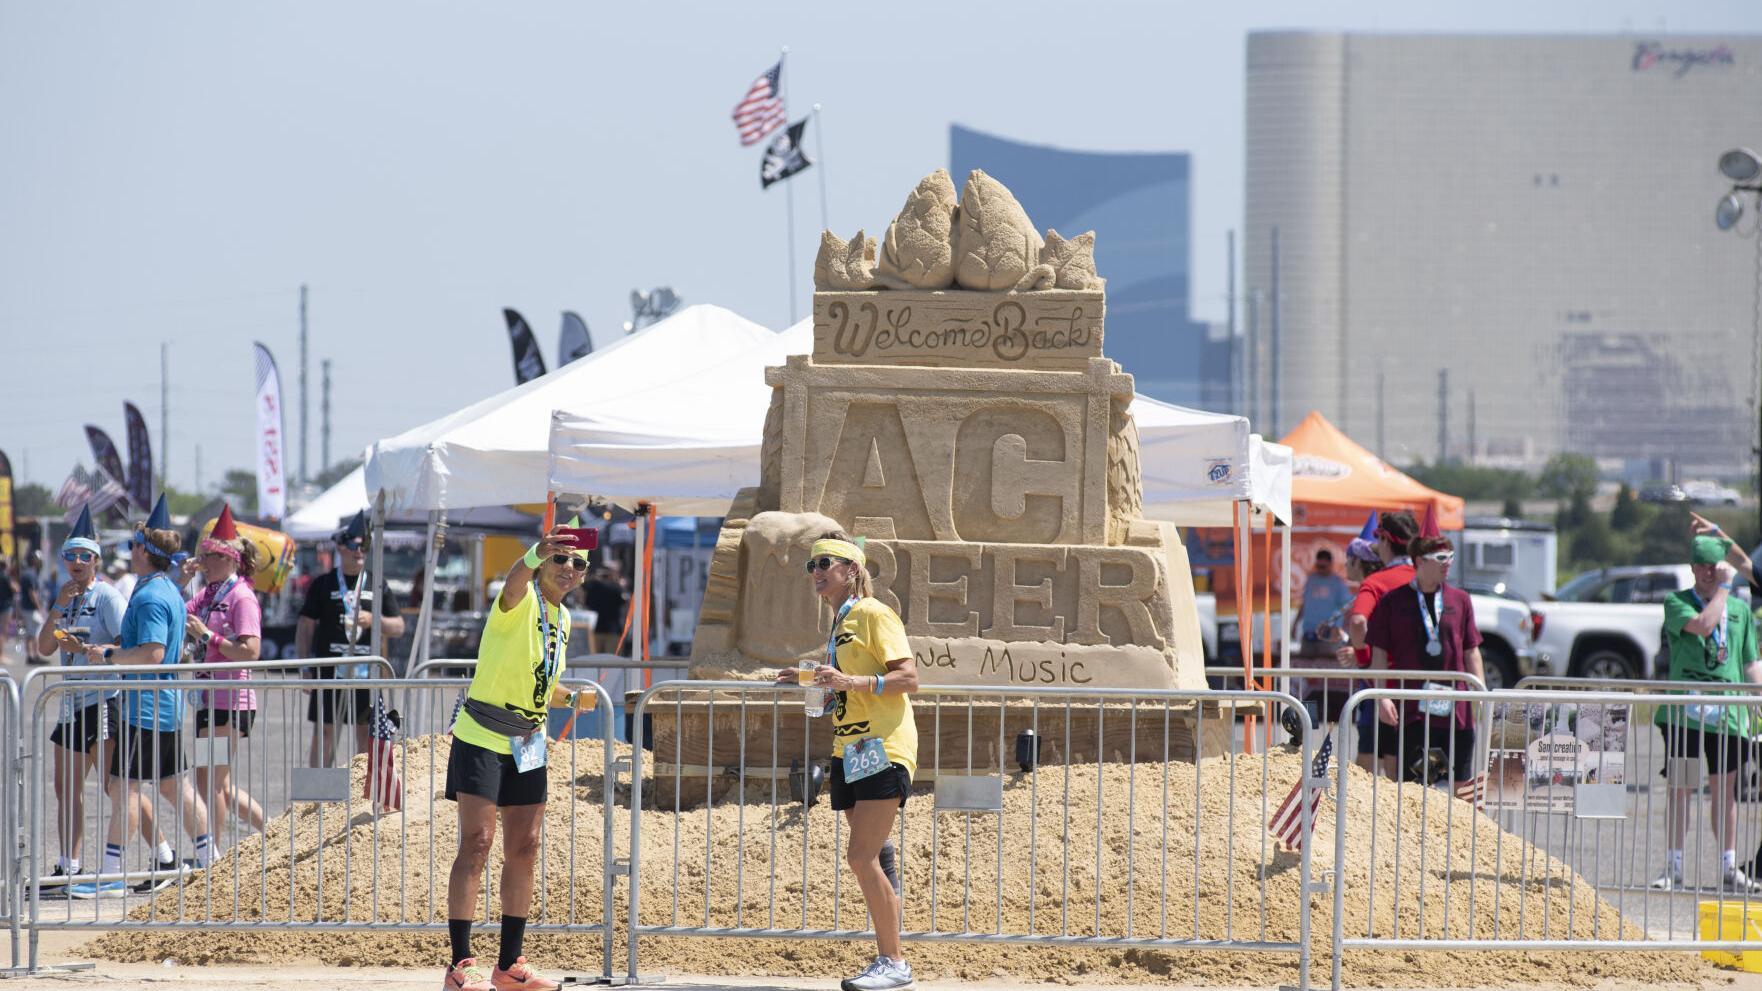 Atlantic City Beer and Music Festival returns to Atlantic City